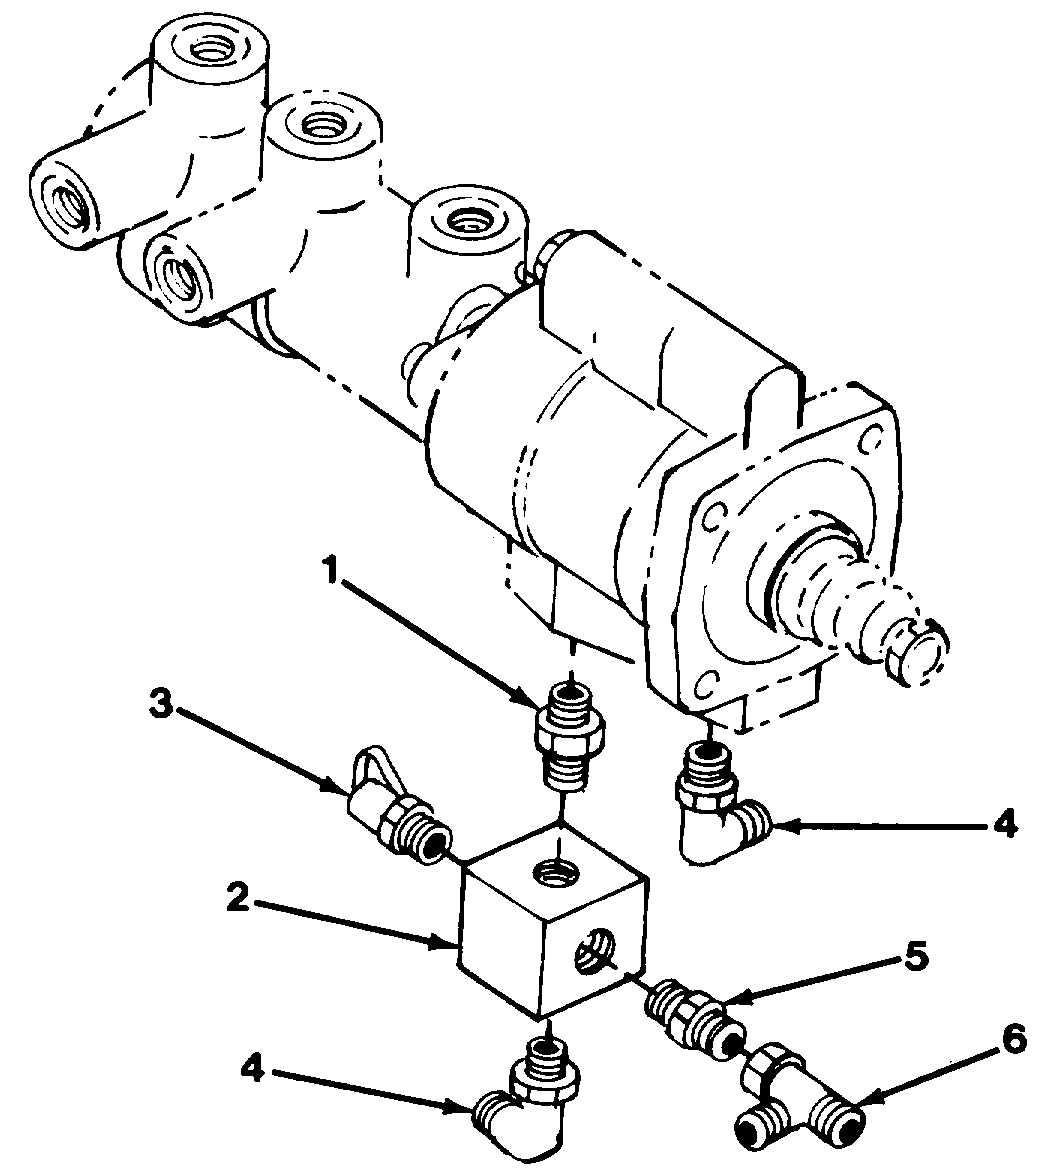 Figure 10-28. Brake Relief Valve Fittings